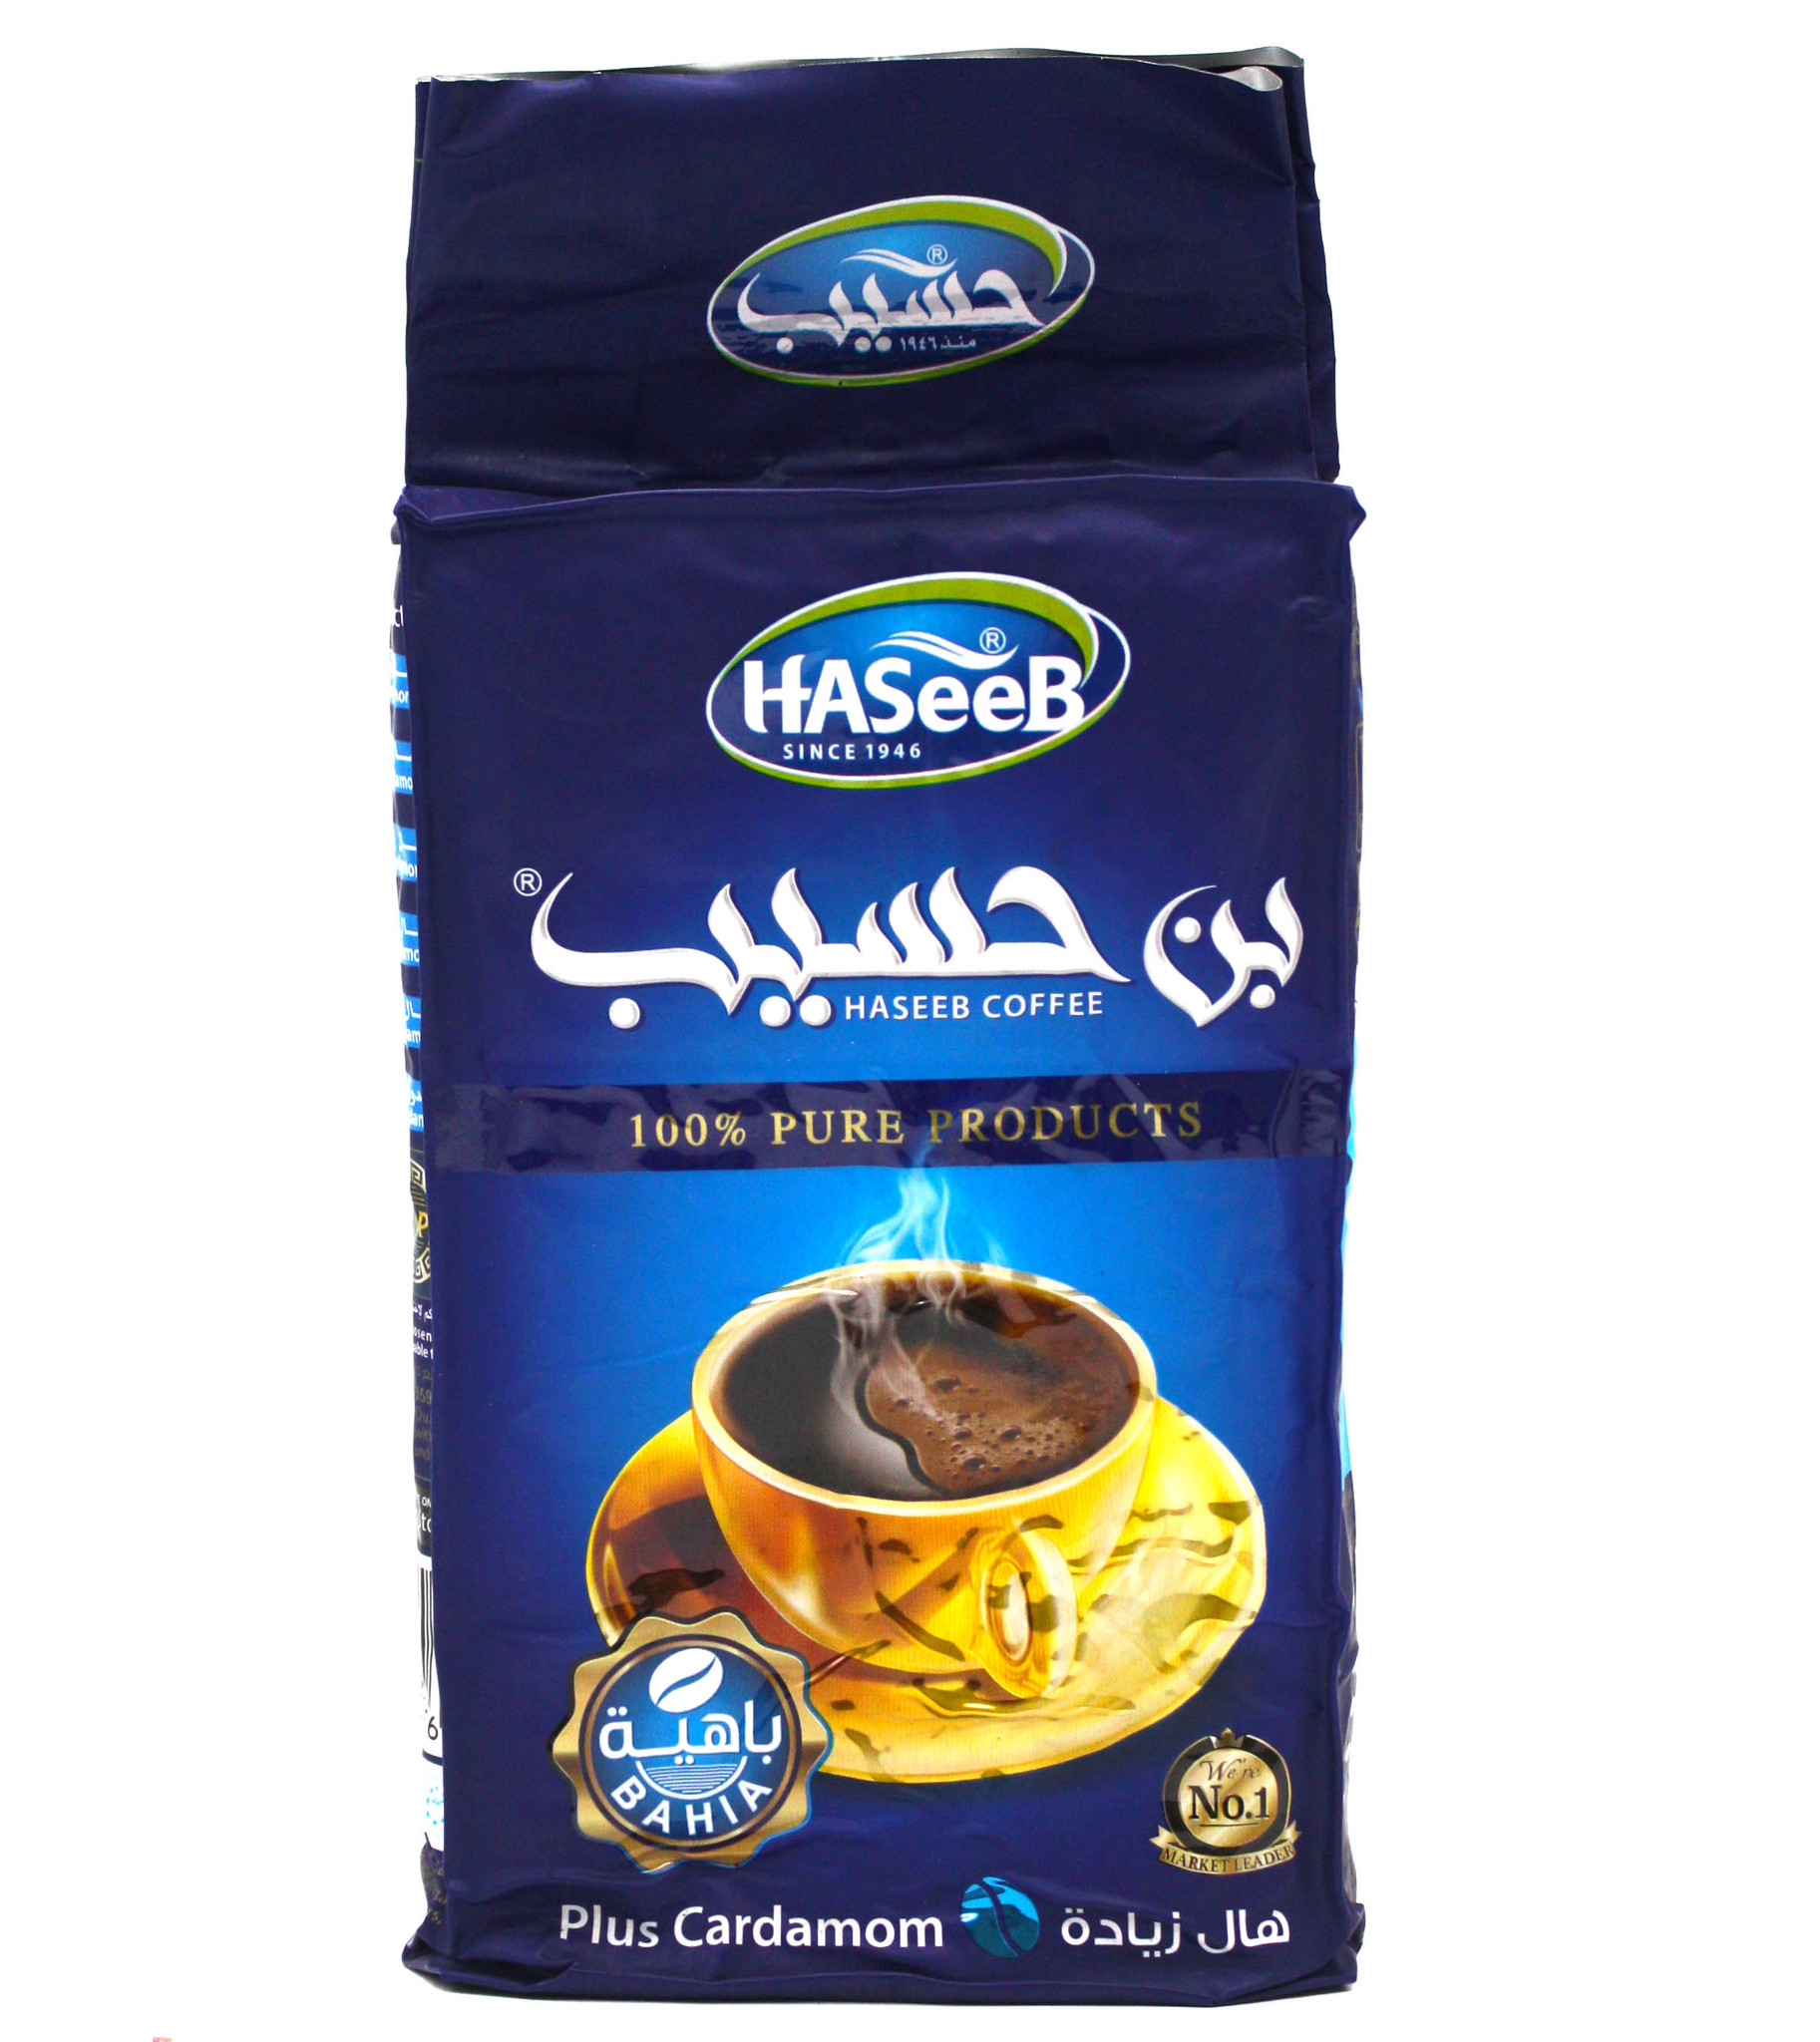 Кофе молотый Арабский кофе Plus Cardamom, Haseeb, 500 г import_files_eb_eb555d1e1a2711e9a9a6484d7ecee297_1ef3f6901b1a11e9a9a6484d7ecee297.jpg